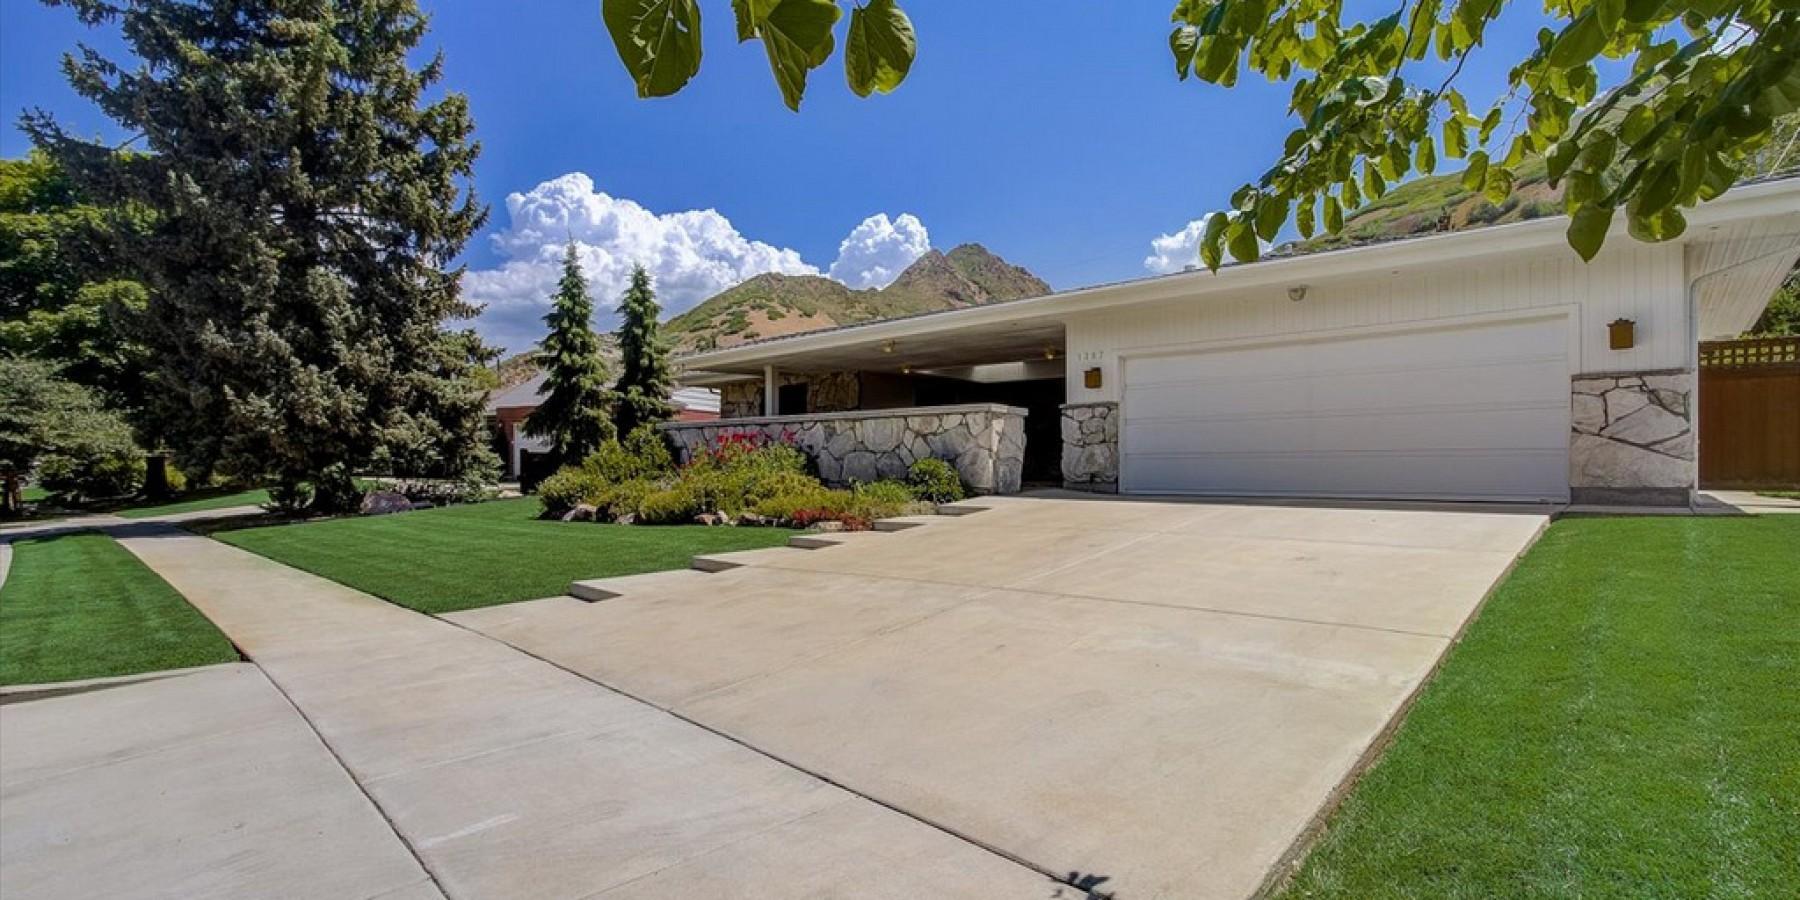 1397 S. Canterbury Drive, Salt Lake City, UT 84108